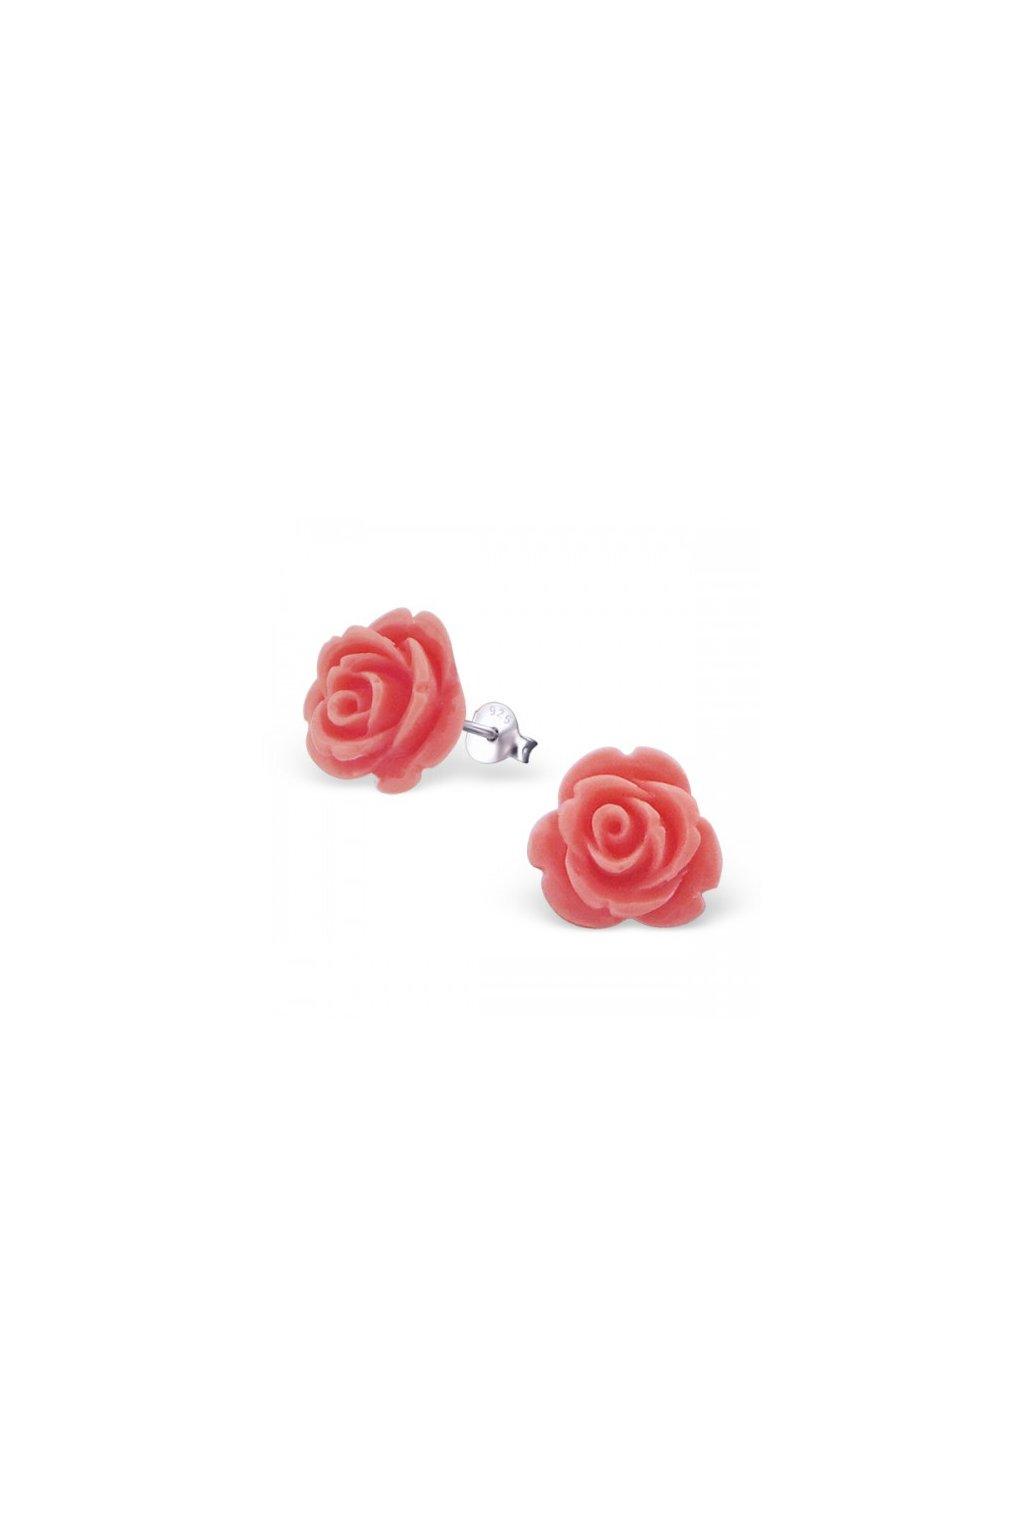 Strieborné náušnice ruže - 925 MS20935